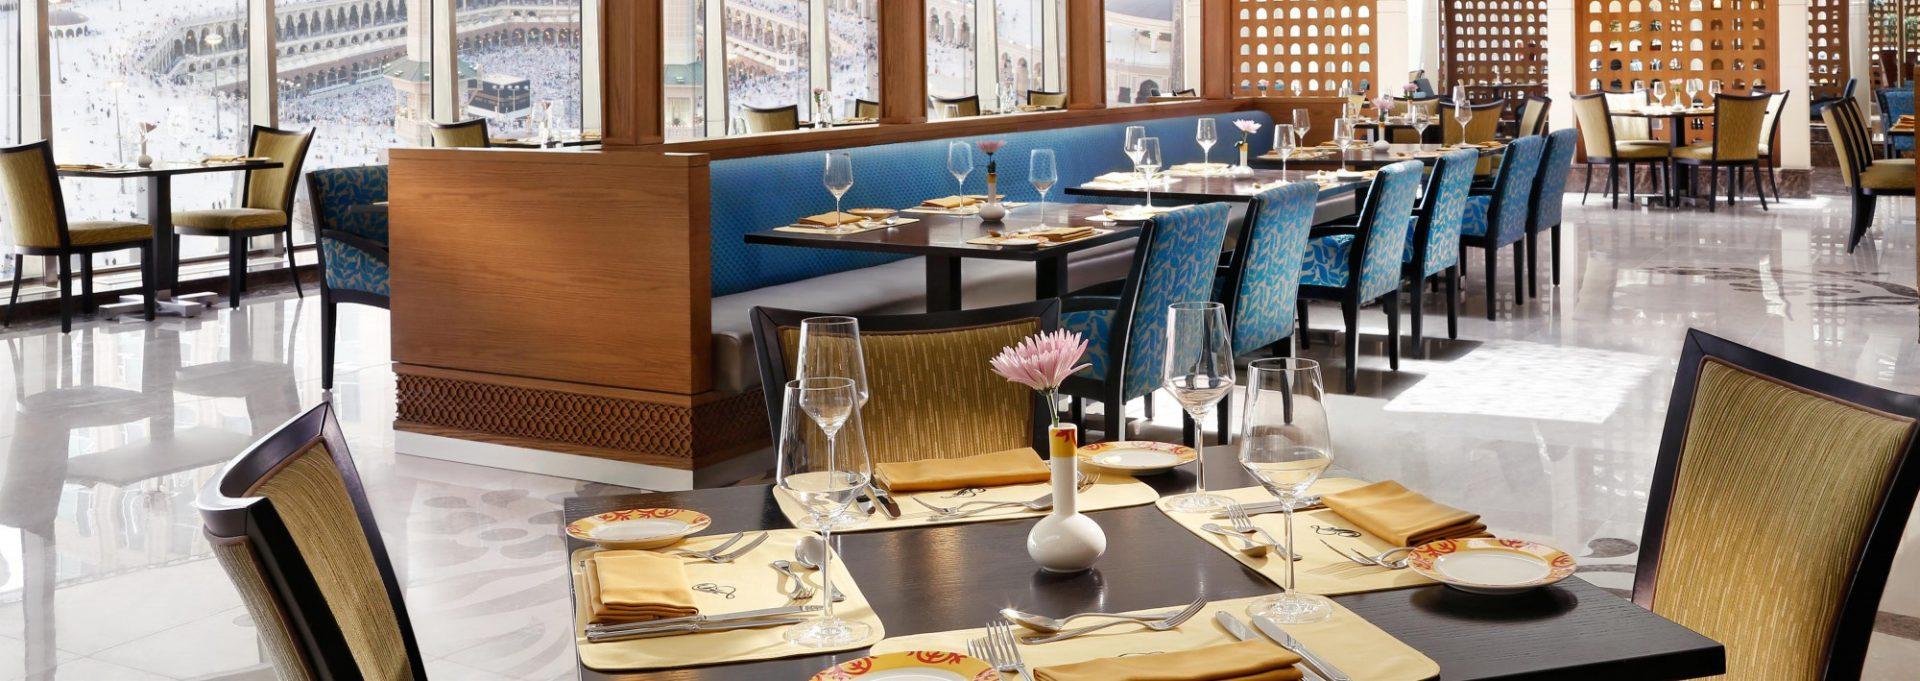 Restaurant_490507_standard11